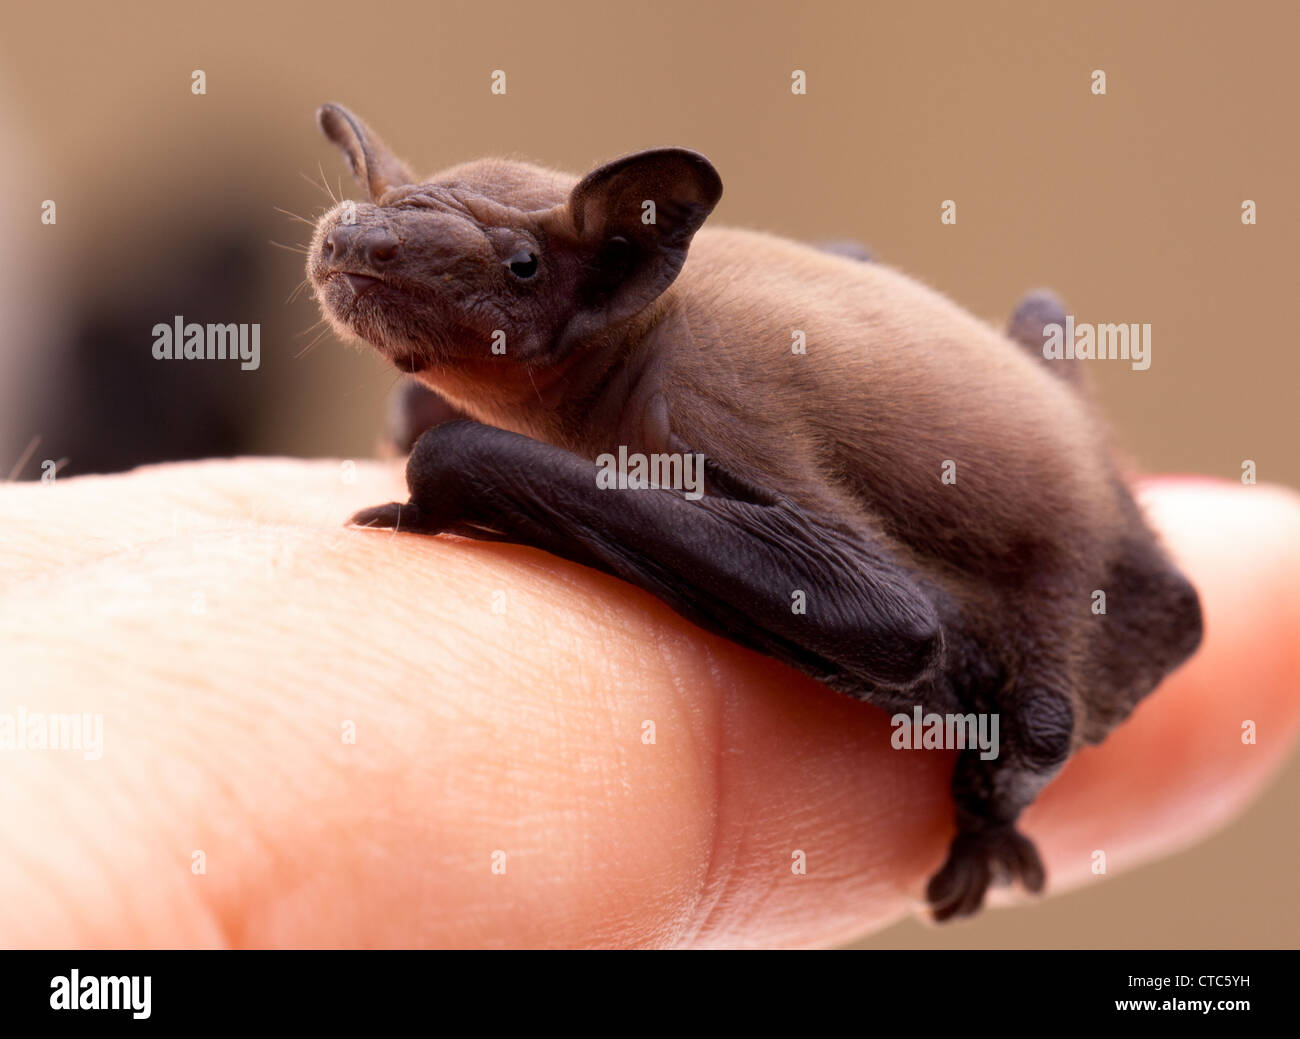 Sweet baby bat on woman finger. - Stock Image